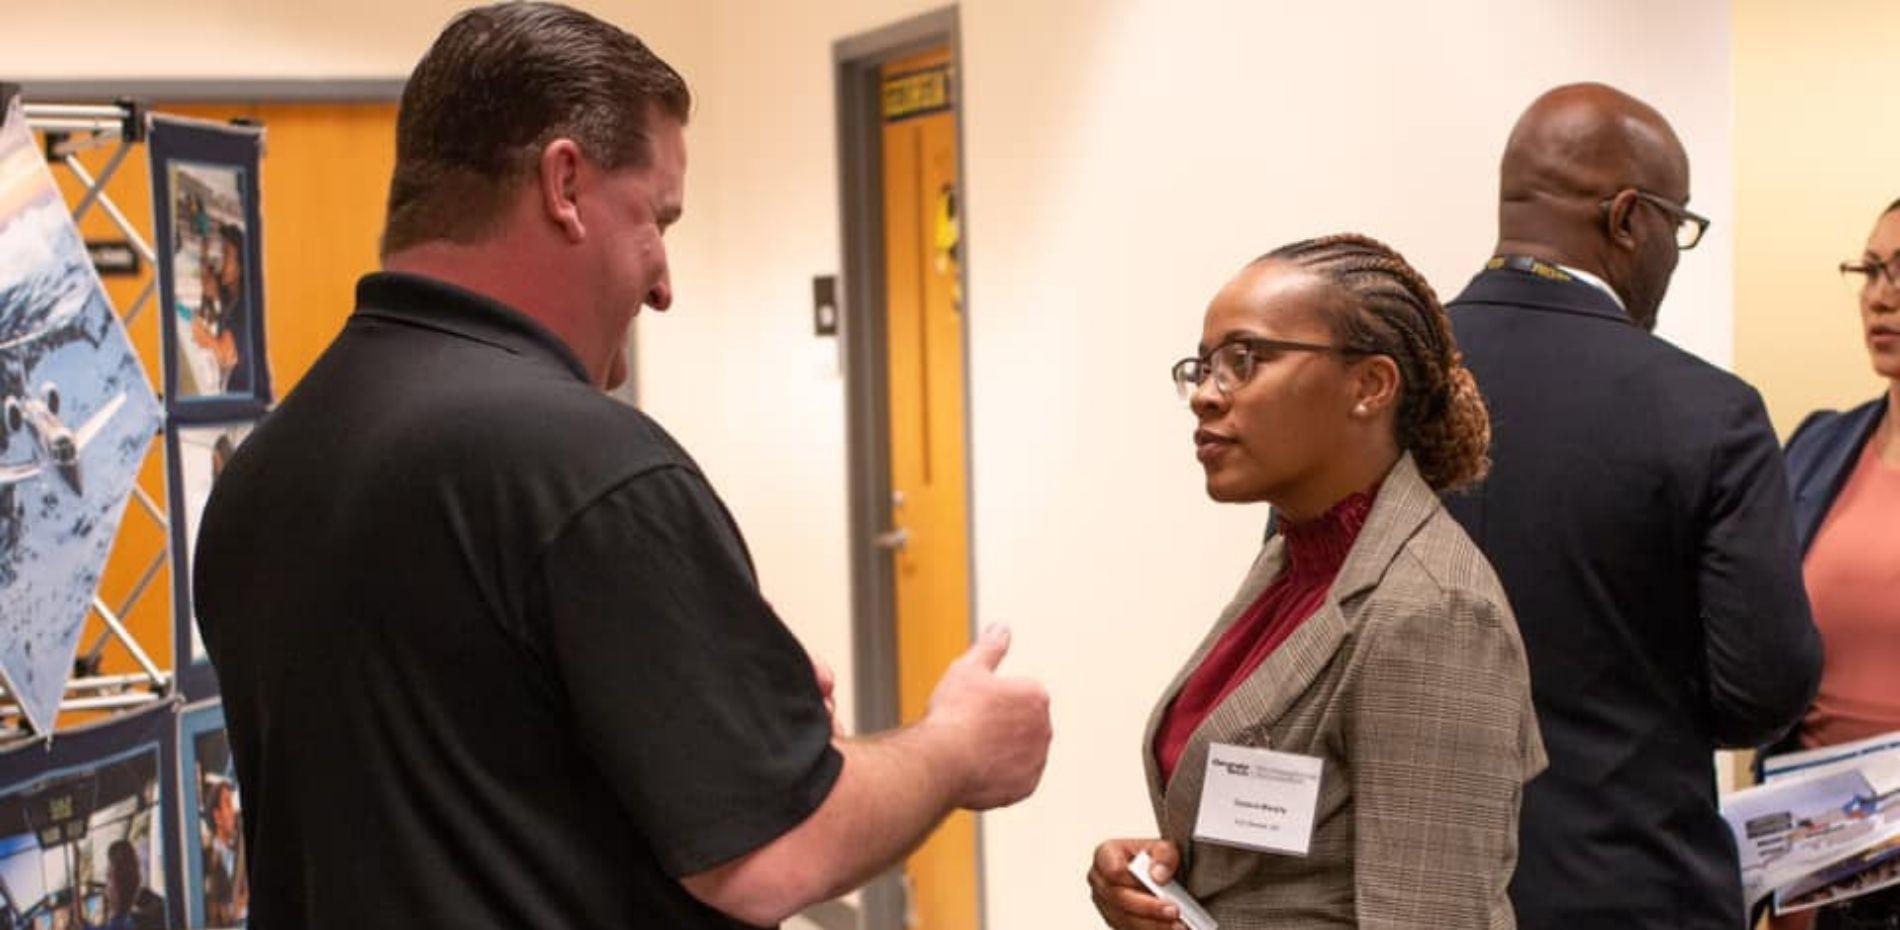 Veteran at career fair talking to potential employer